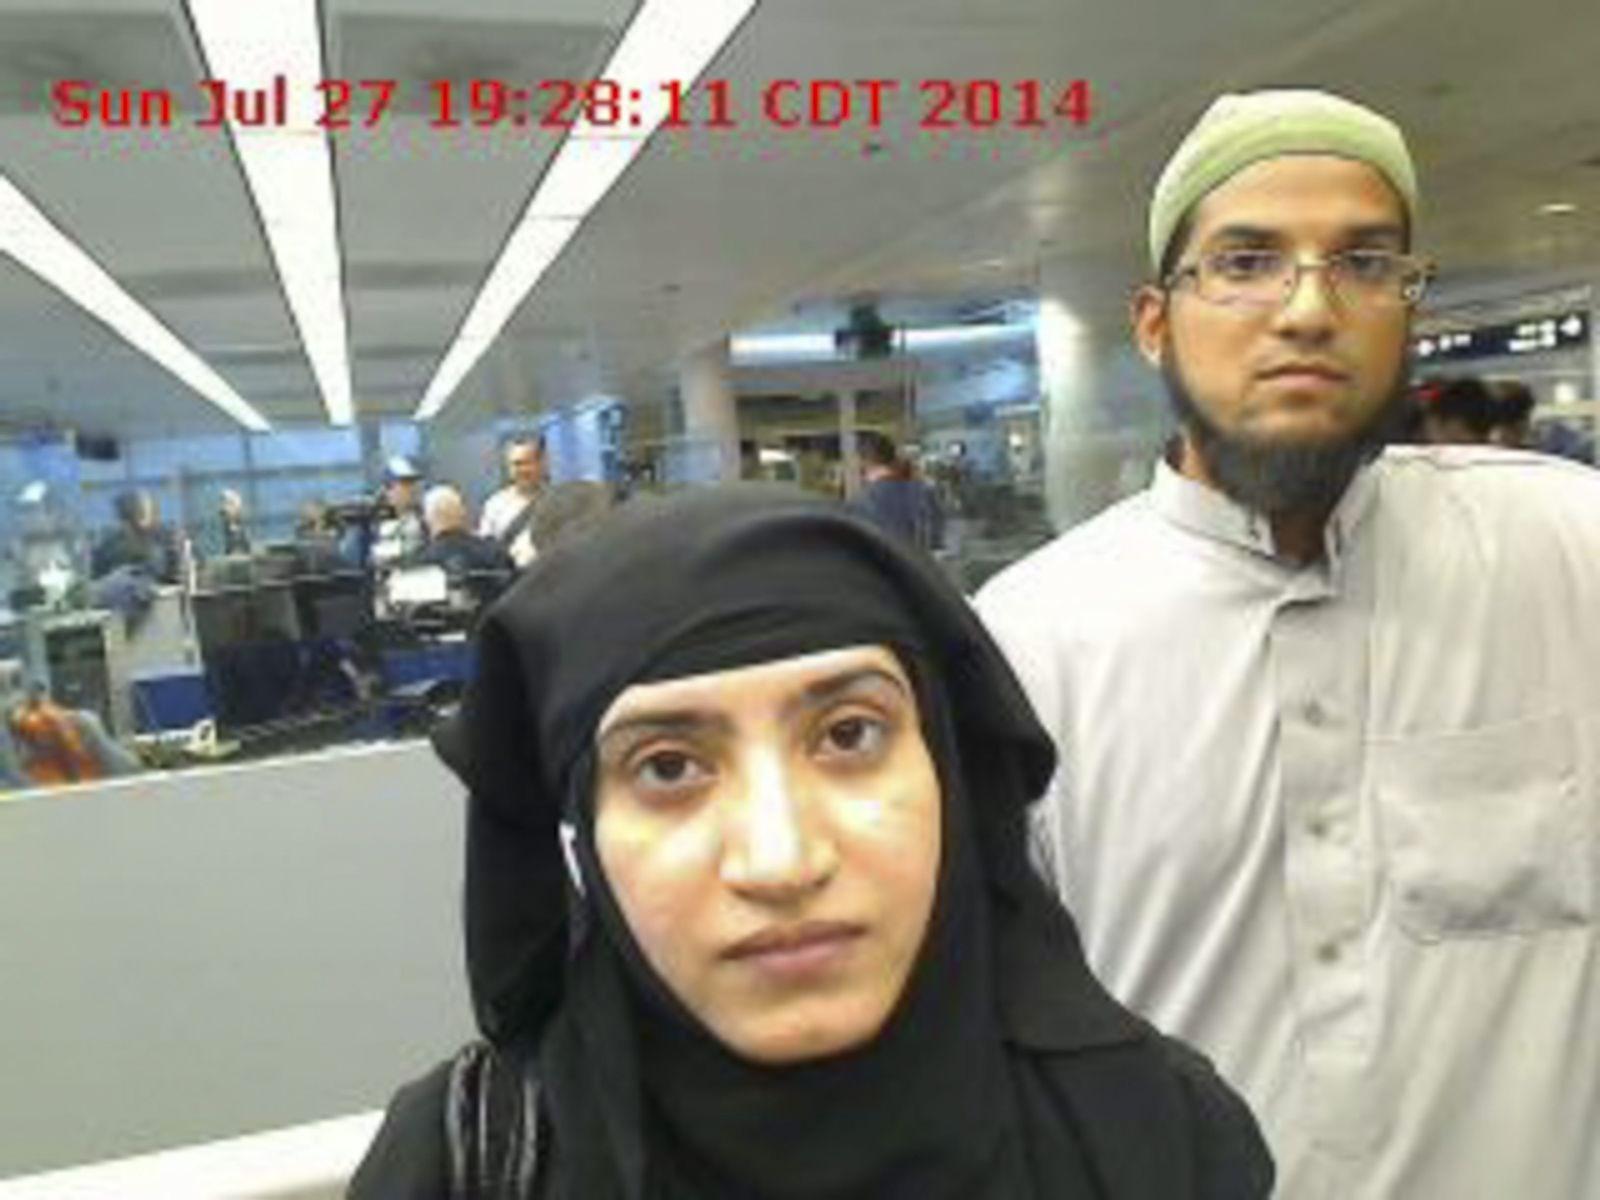 San Bernadino Attentäter FBI Handy Apple Syed Rizwan Farook Tashfeen Malik